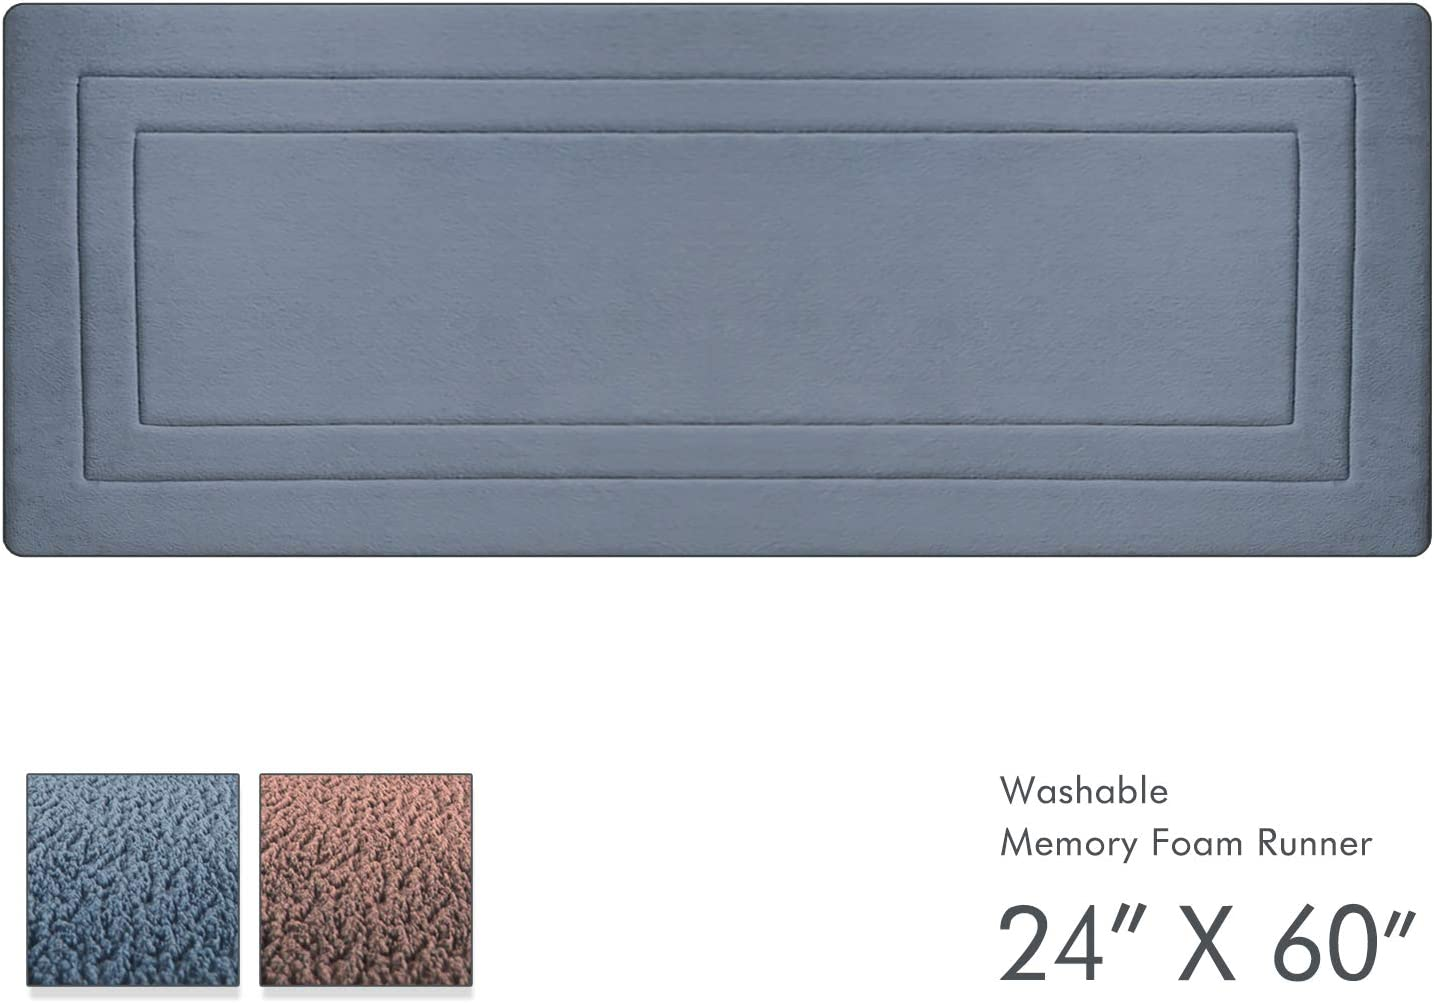 "Ellendi 24"" X 60"" Long Memory Foam Rug - Non-Slip Kitchen Runner and Large Bath Mat for Bathroom, Bedroom, and Laundry Room Floor, Gray-Blue"